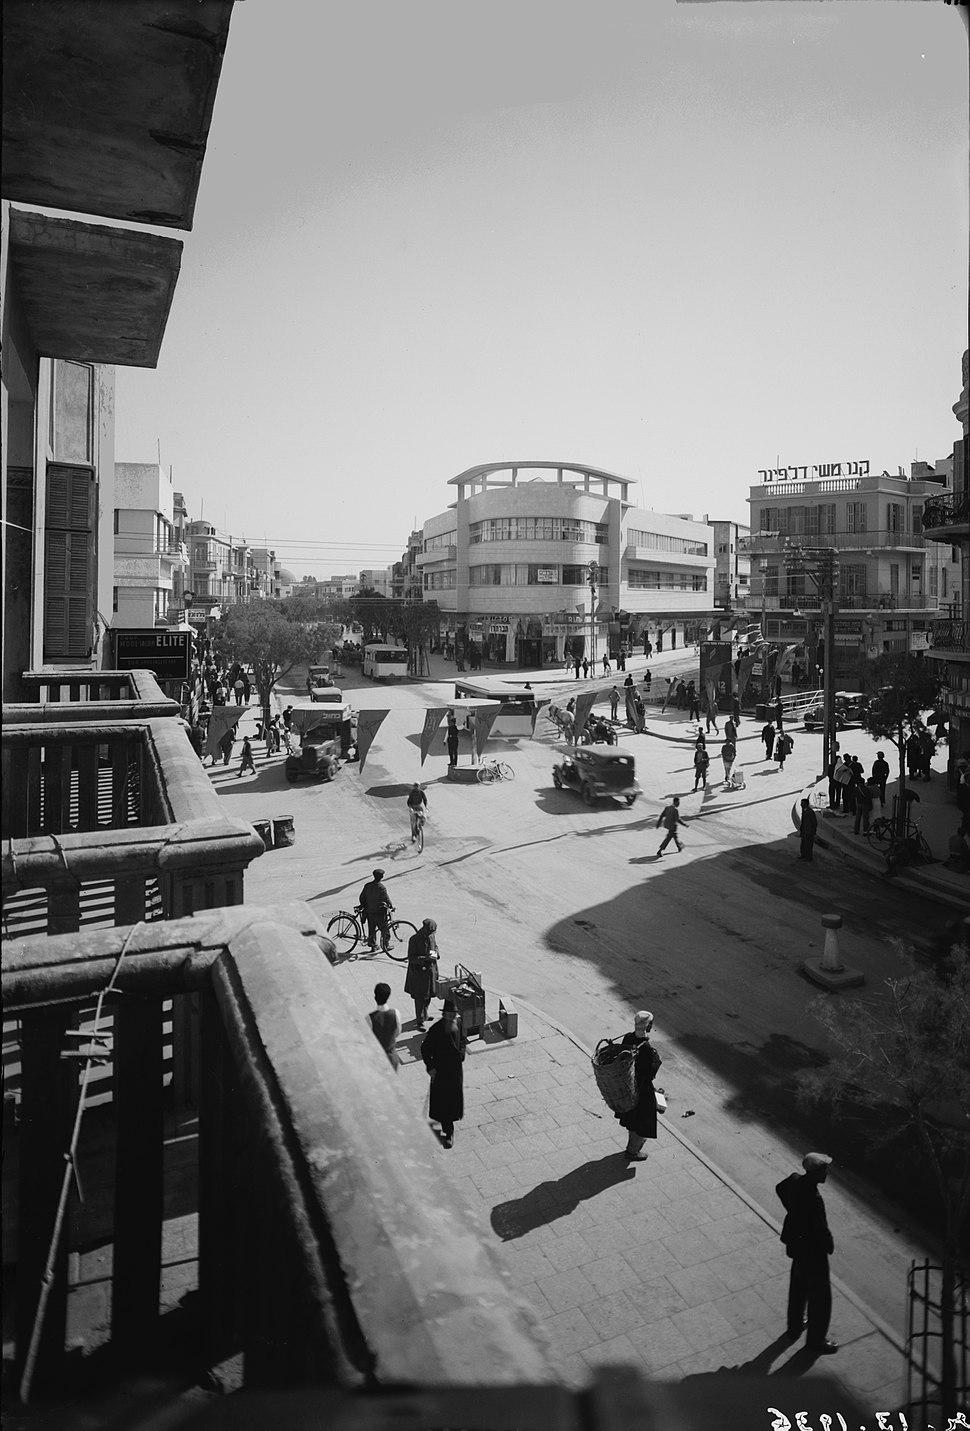 Tel Aviv - Magen David Square - 1936